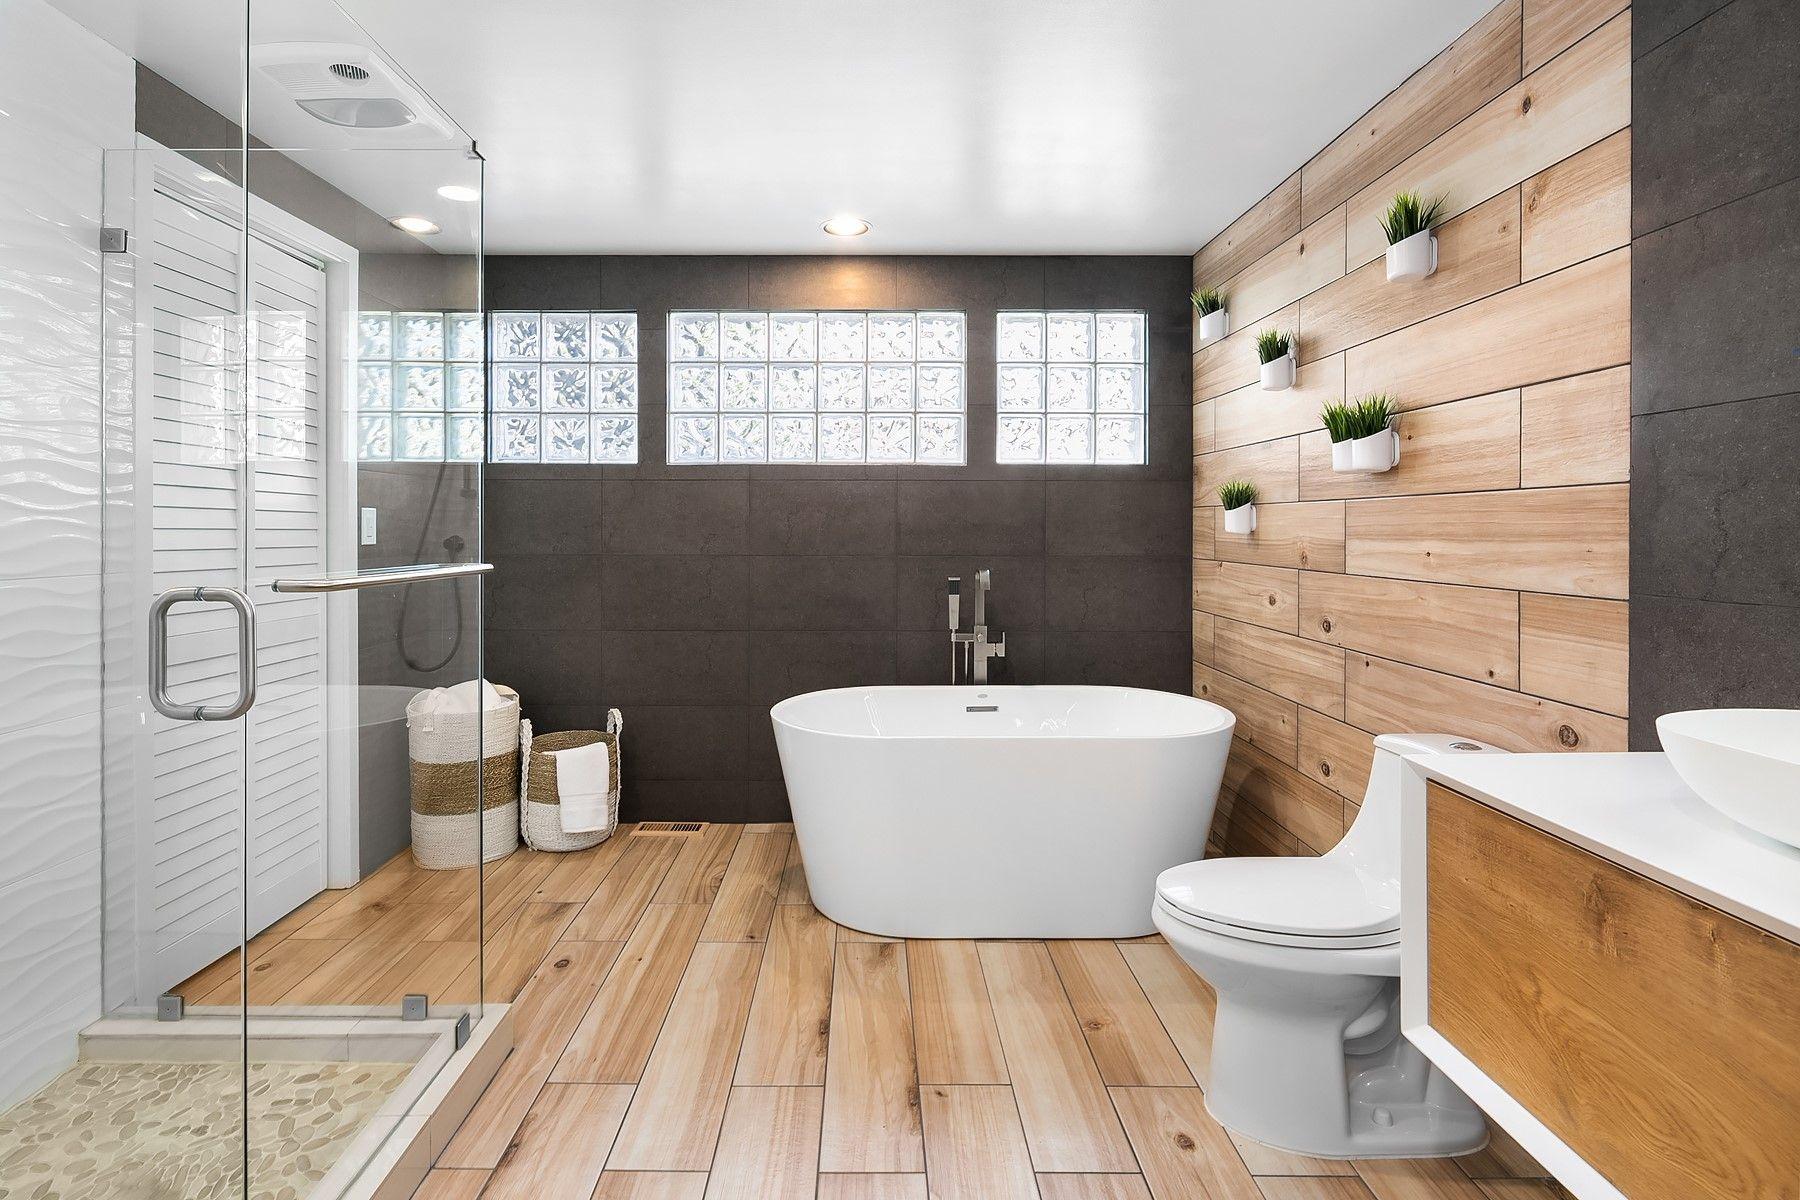 Celeste Freestanding Bath Dream Bathrooms Small Bathroom Renovations Bathroom Renovation Diy